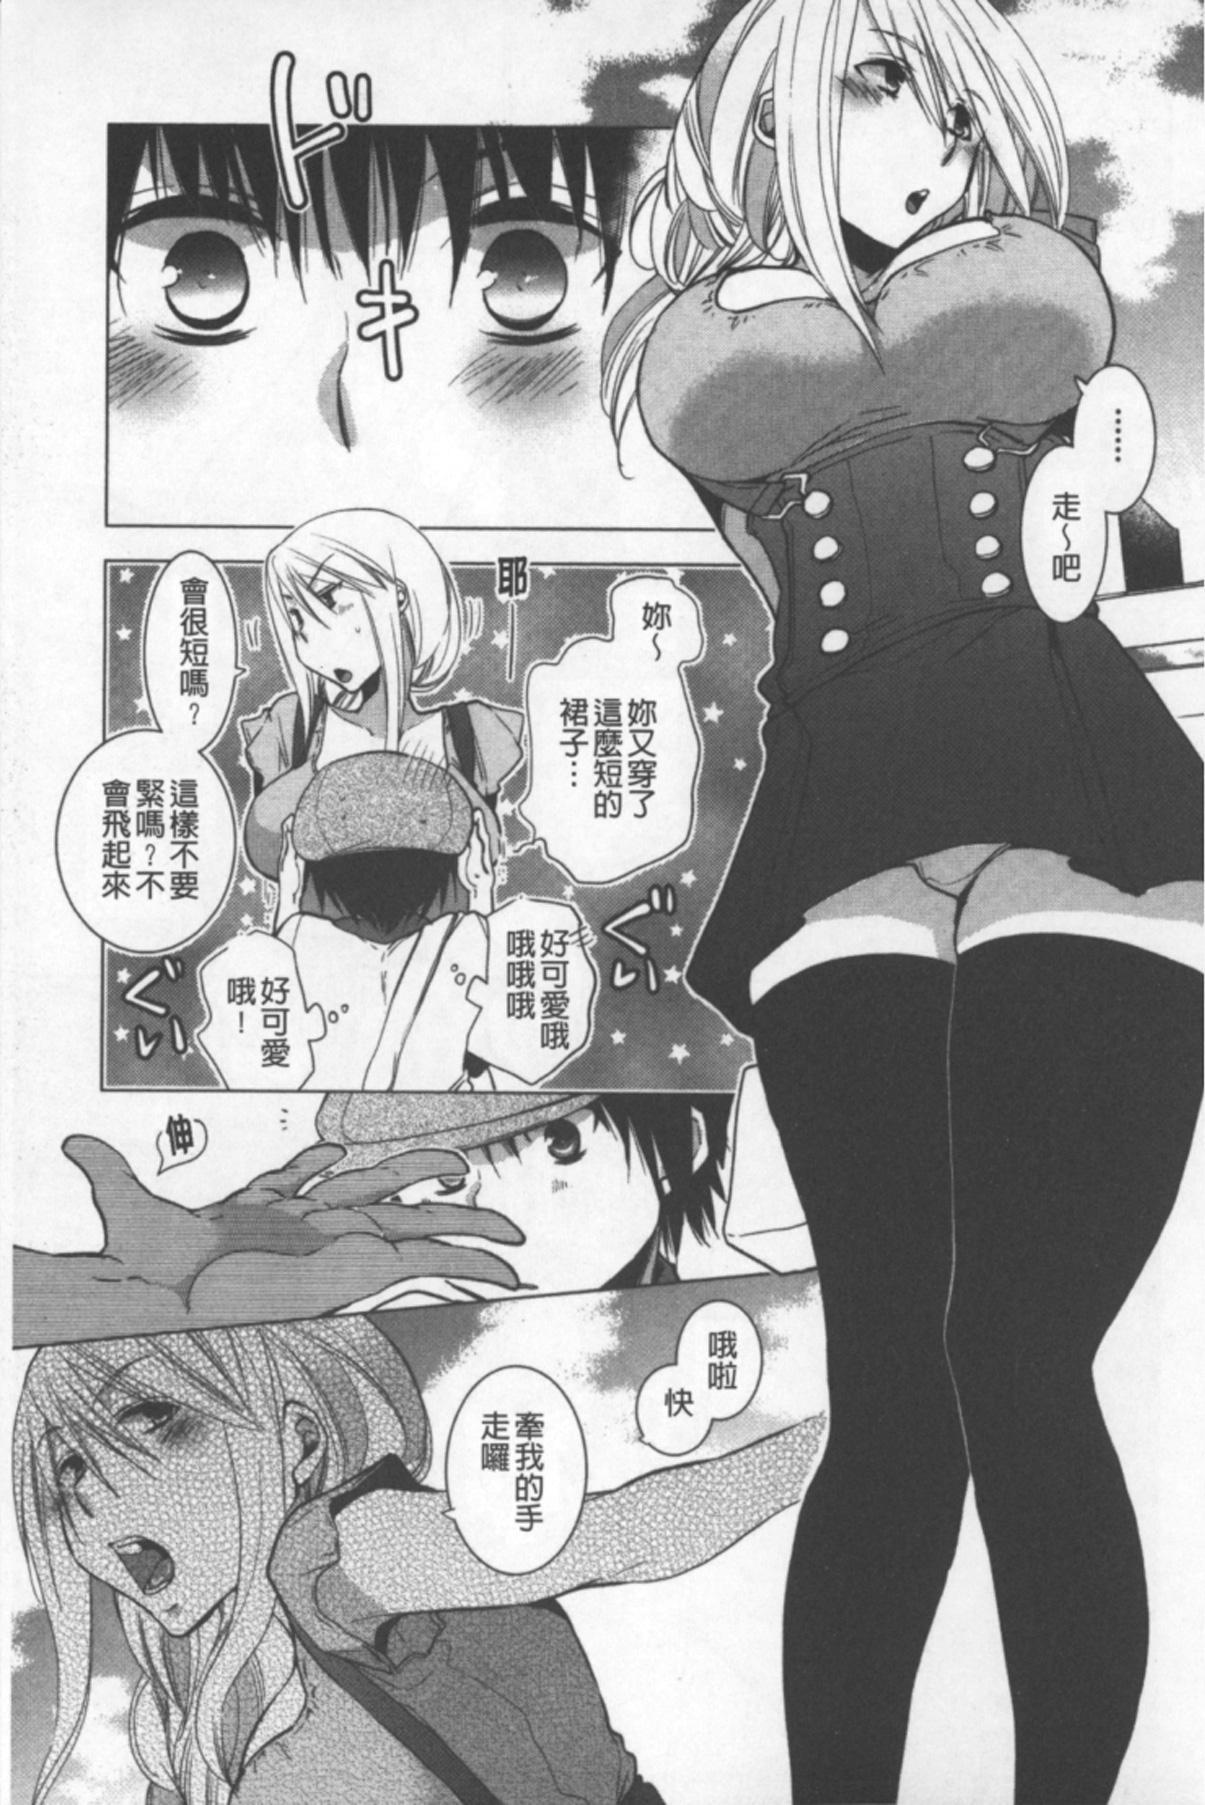 OneShota Renshuu Erotica Drill | 淫姊小正太練習 性愛技術實地鑽研 25